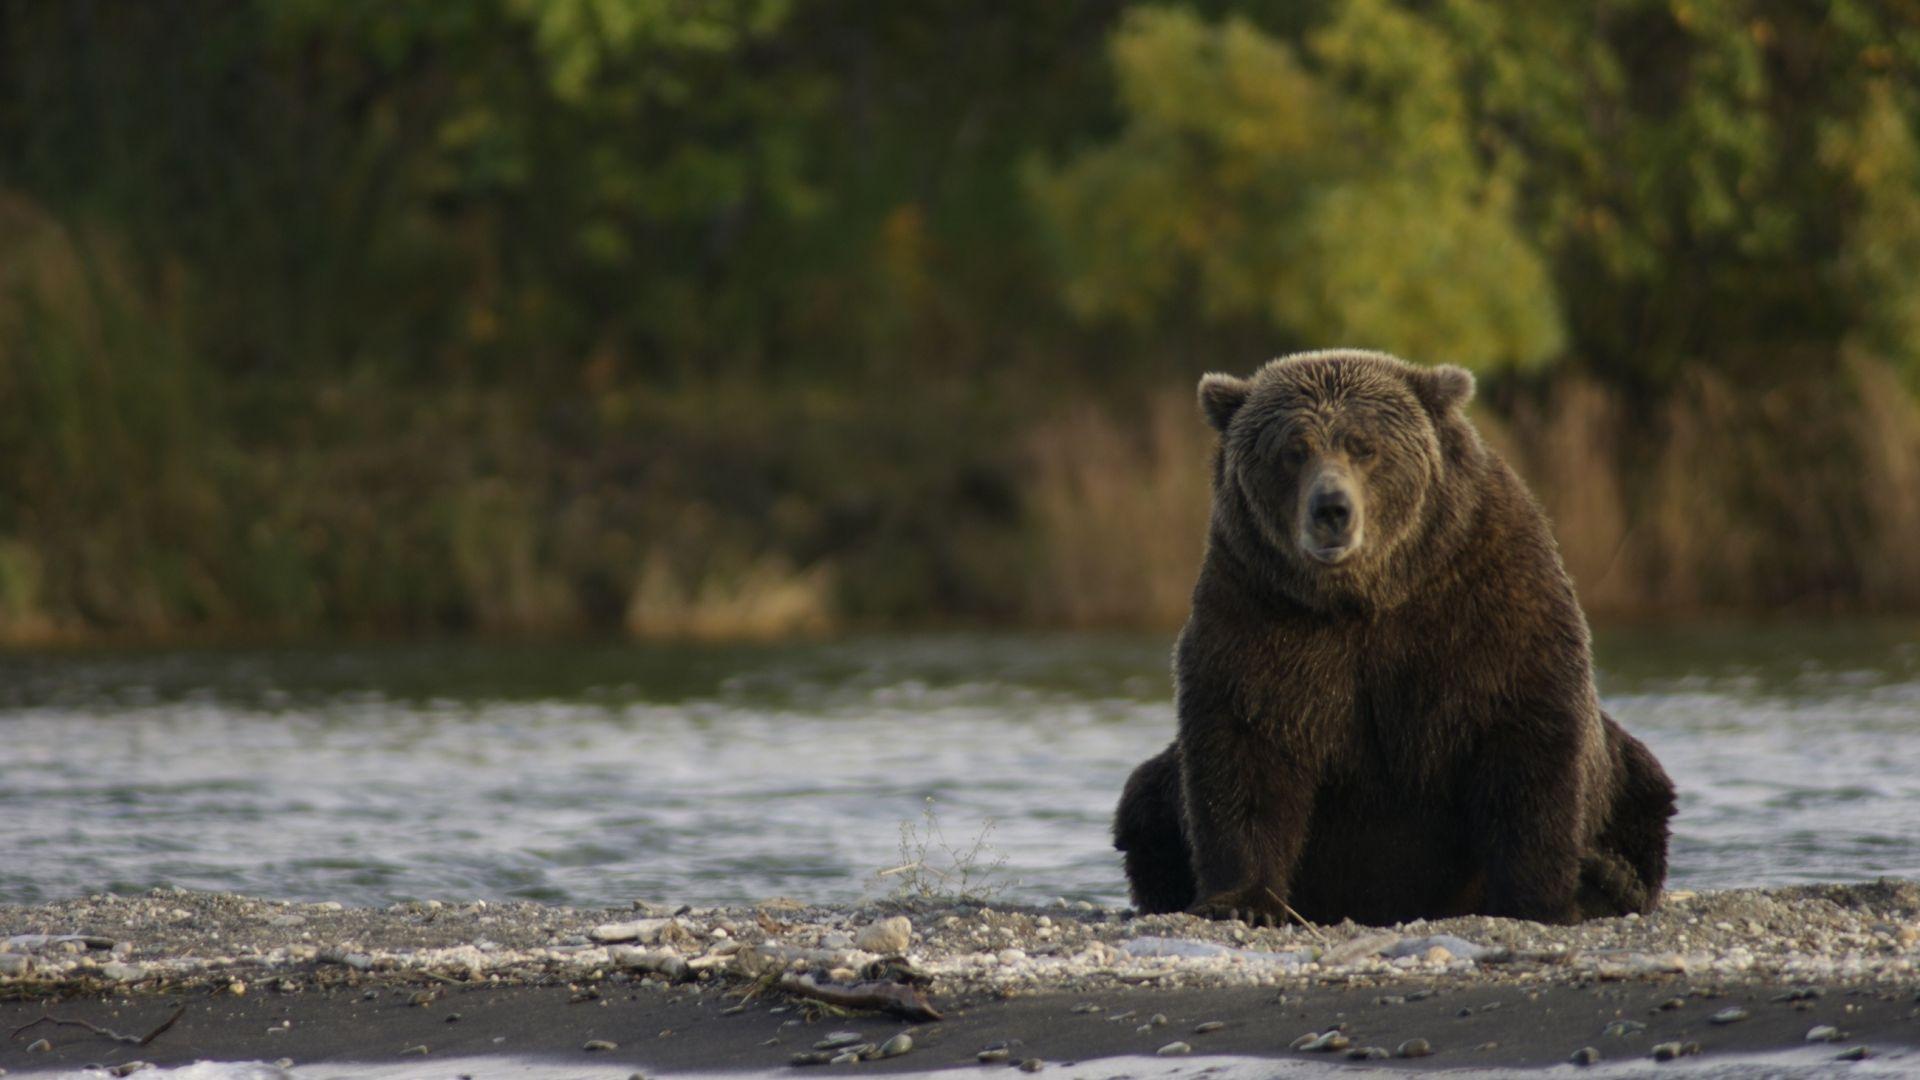 Wallpaper Bear, wild animal, predator, sitting, wildlife